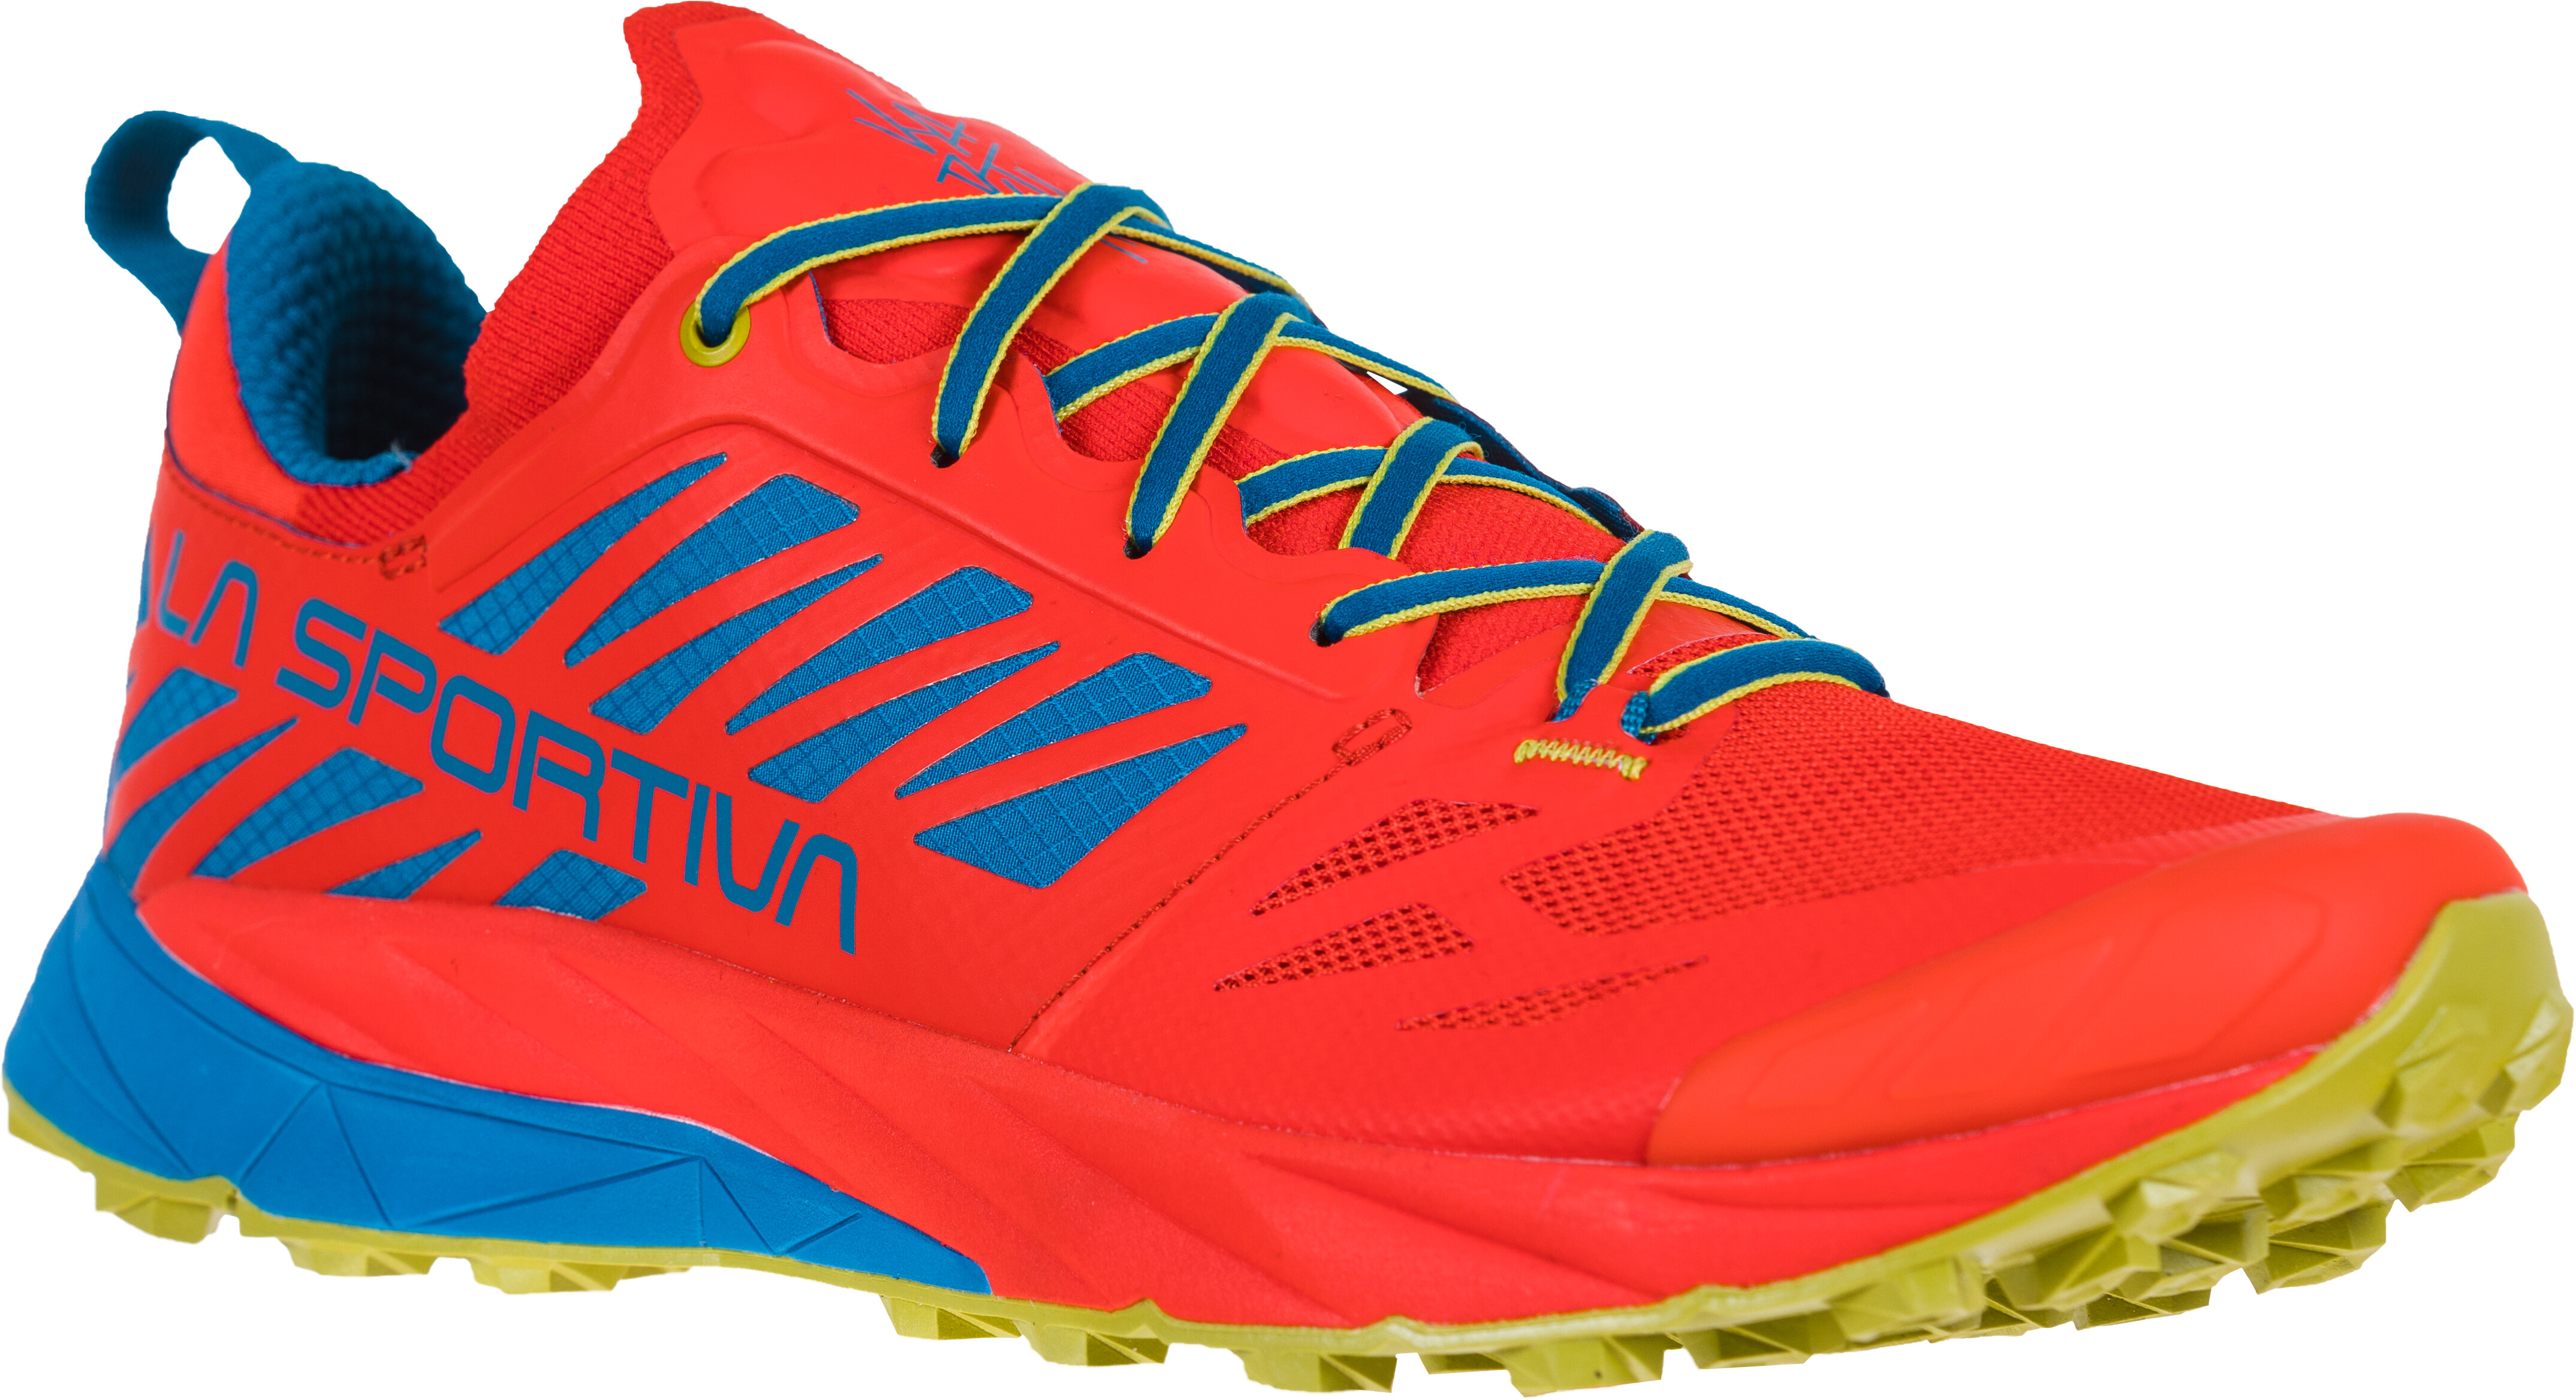 la sportiva kaptiva gore-tex trail running shoes - mens